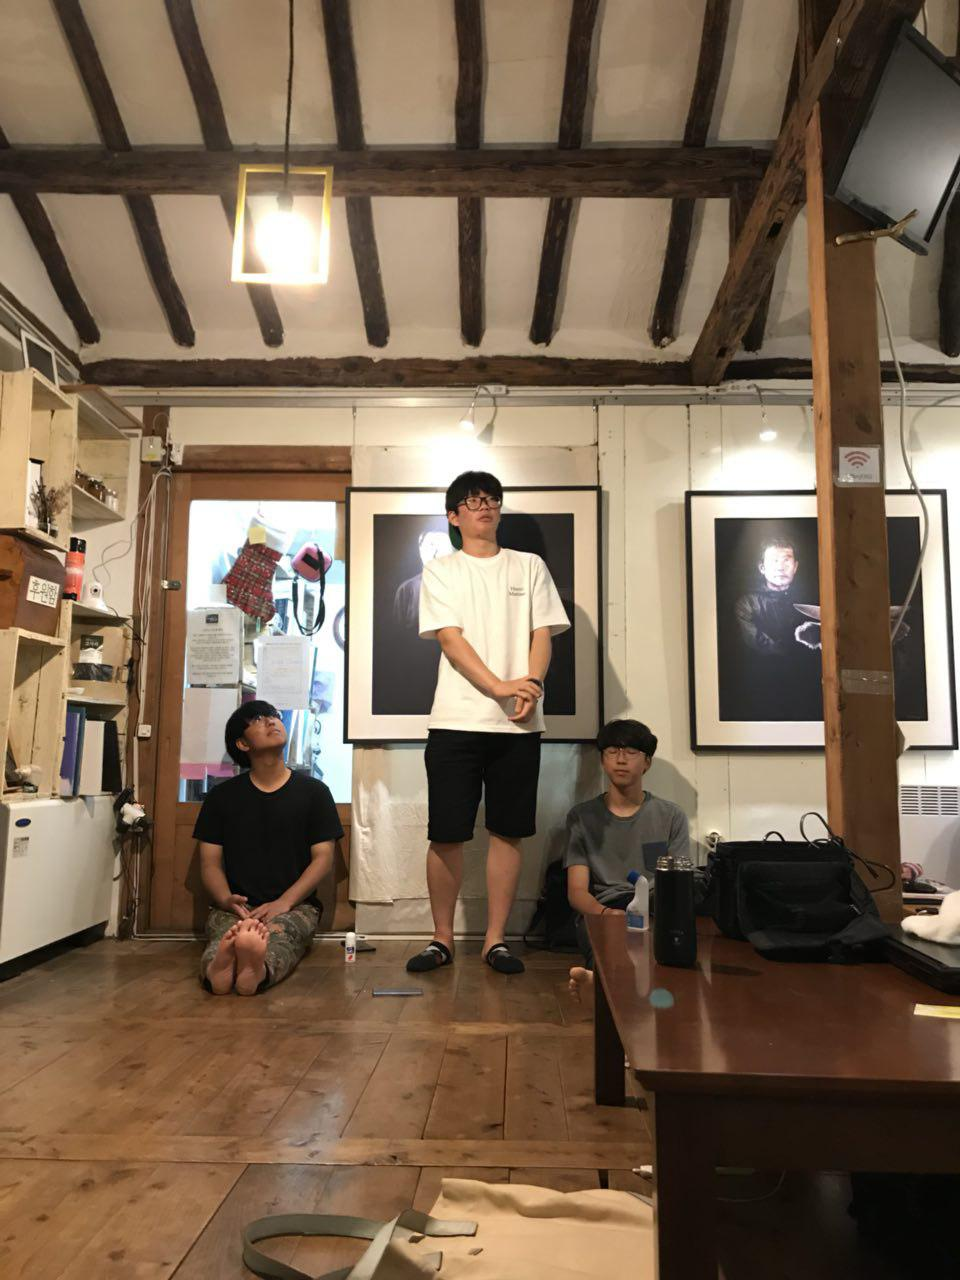 photo_2018-07-05_06-32-22.jpg